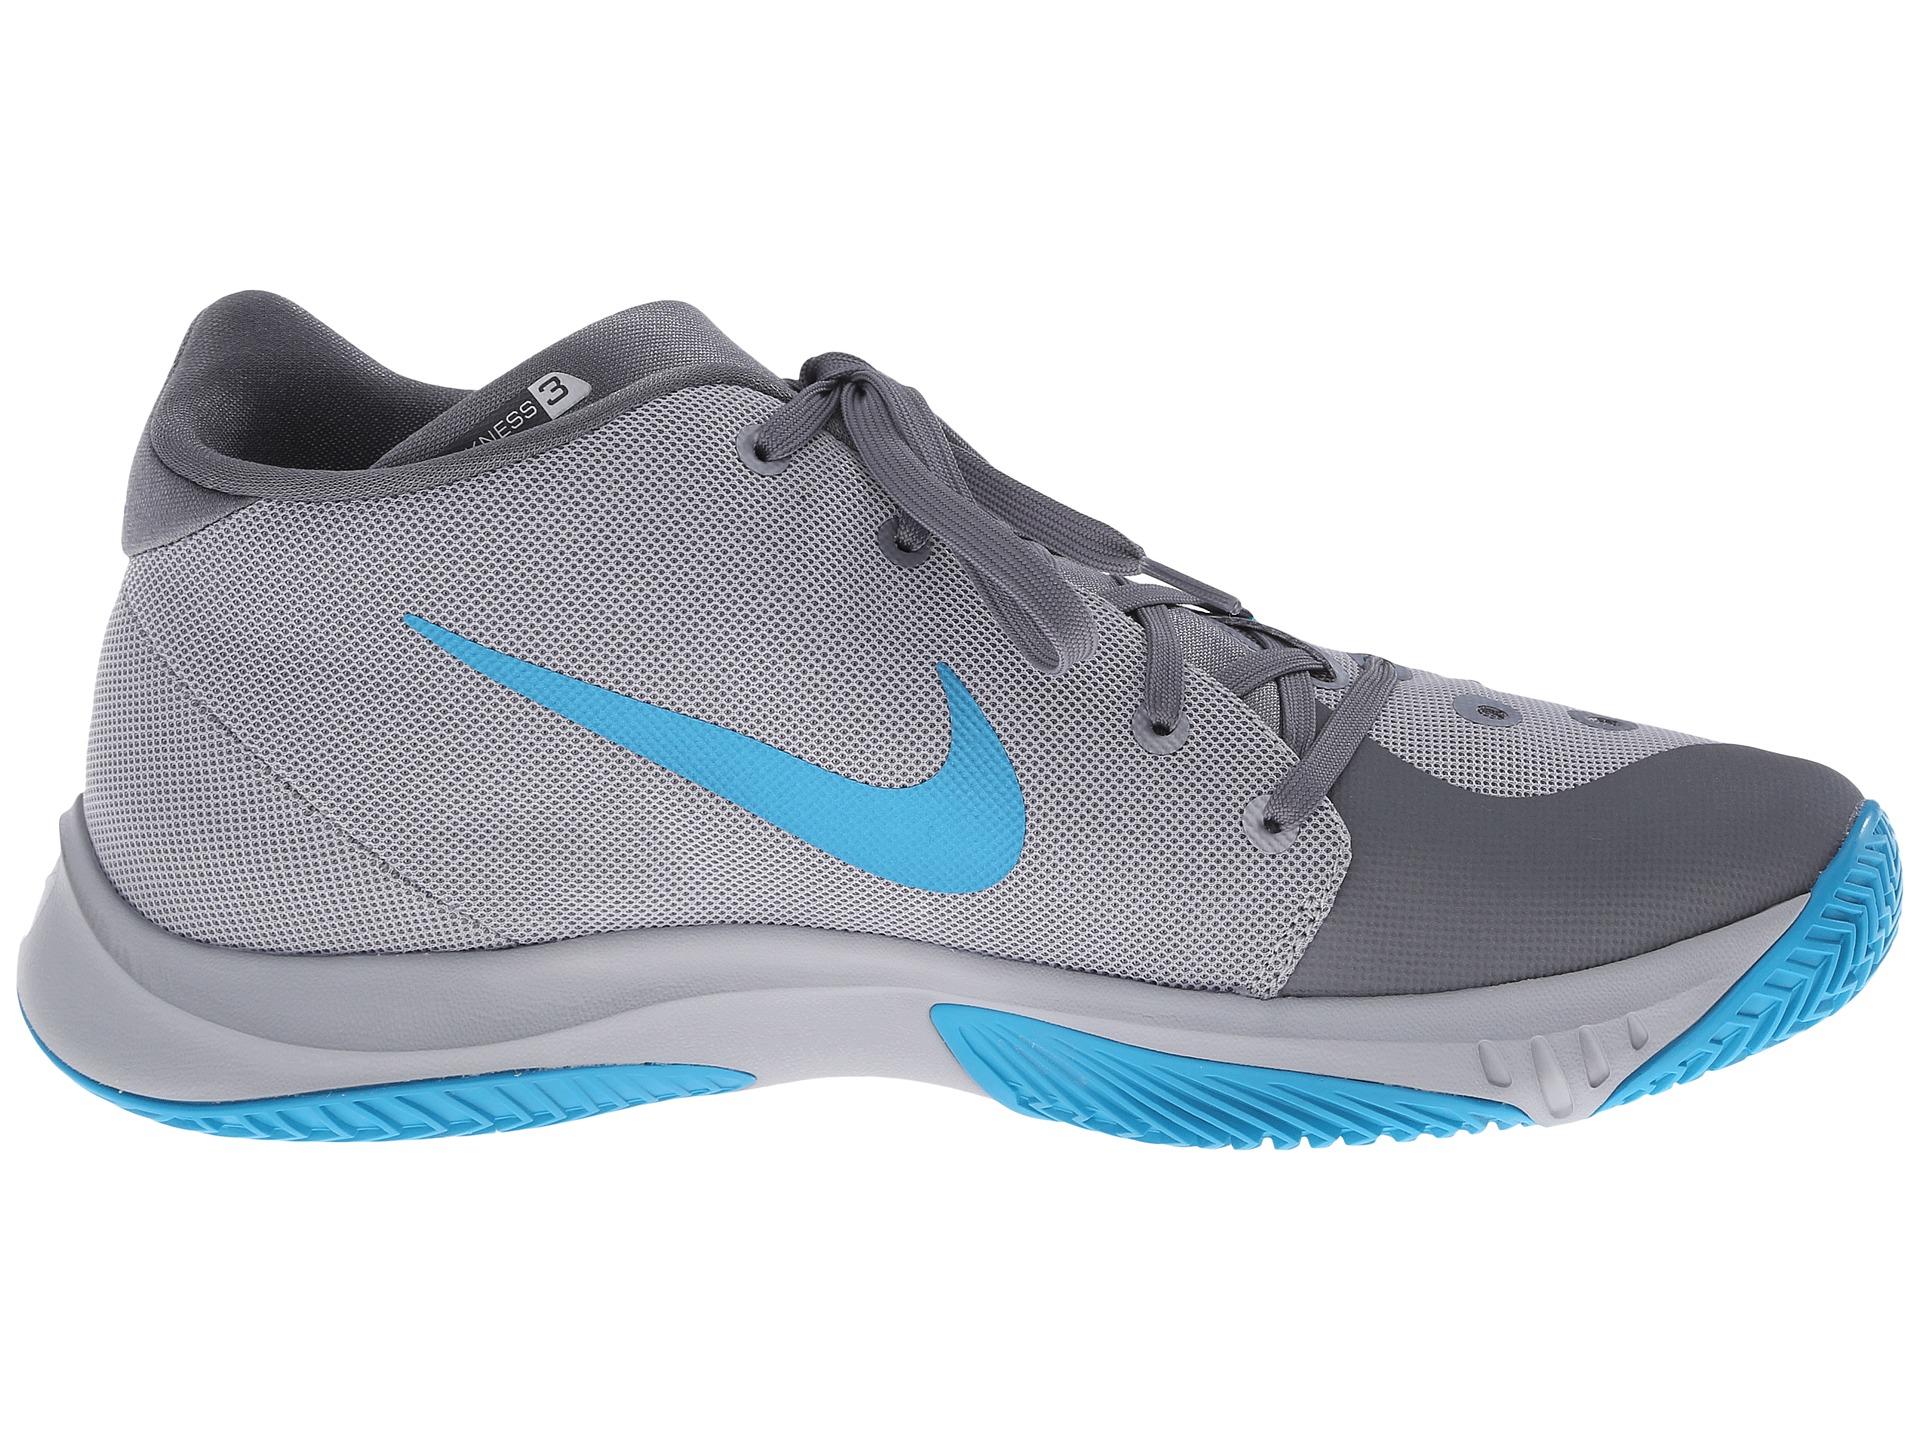 6e70f9c65b1c8 Lyst - Nike Zoom Hyperquickness 2015 in Gray for Men